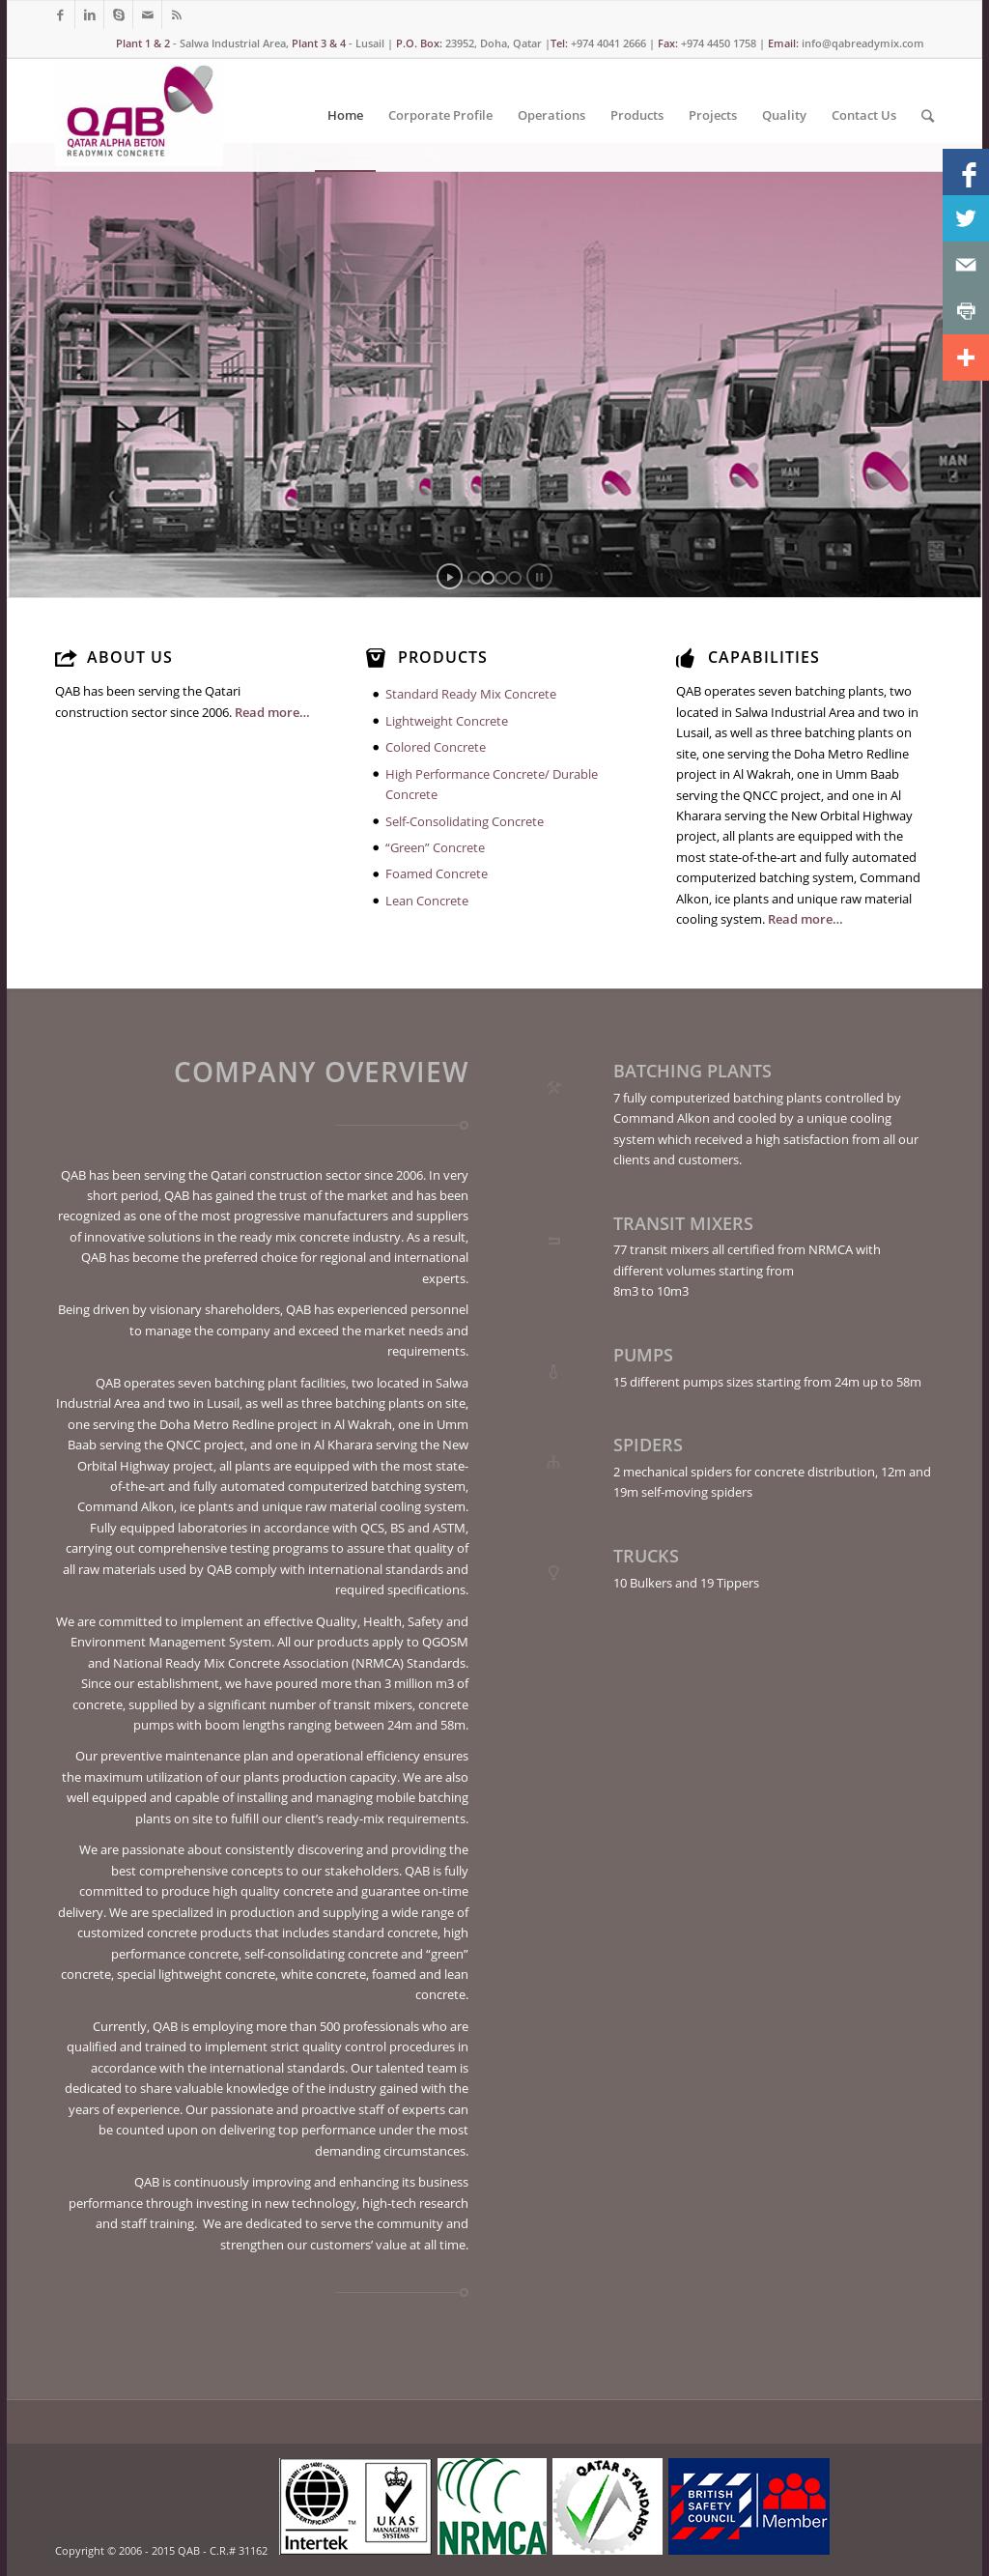 Qatar Alpha Beton Readymix Concrete Competitors, Revenue and